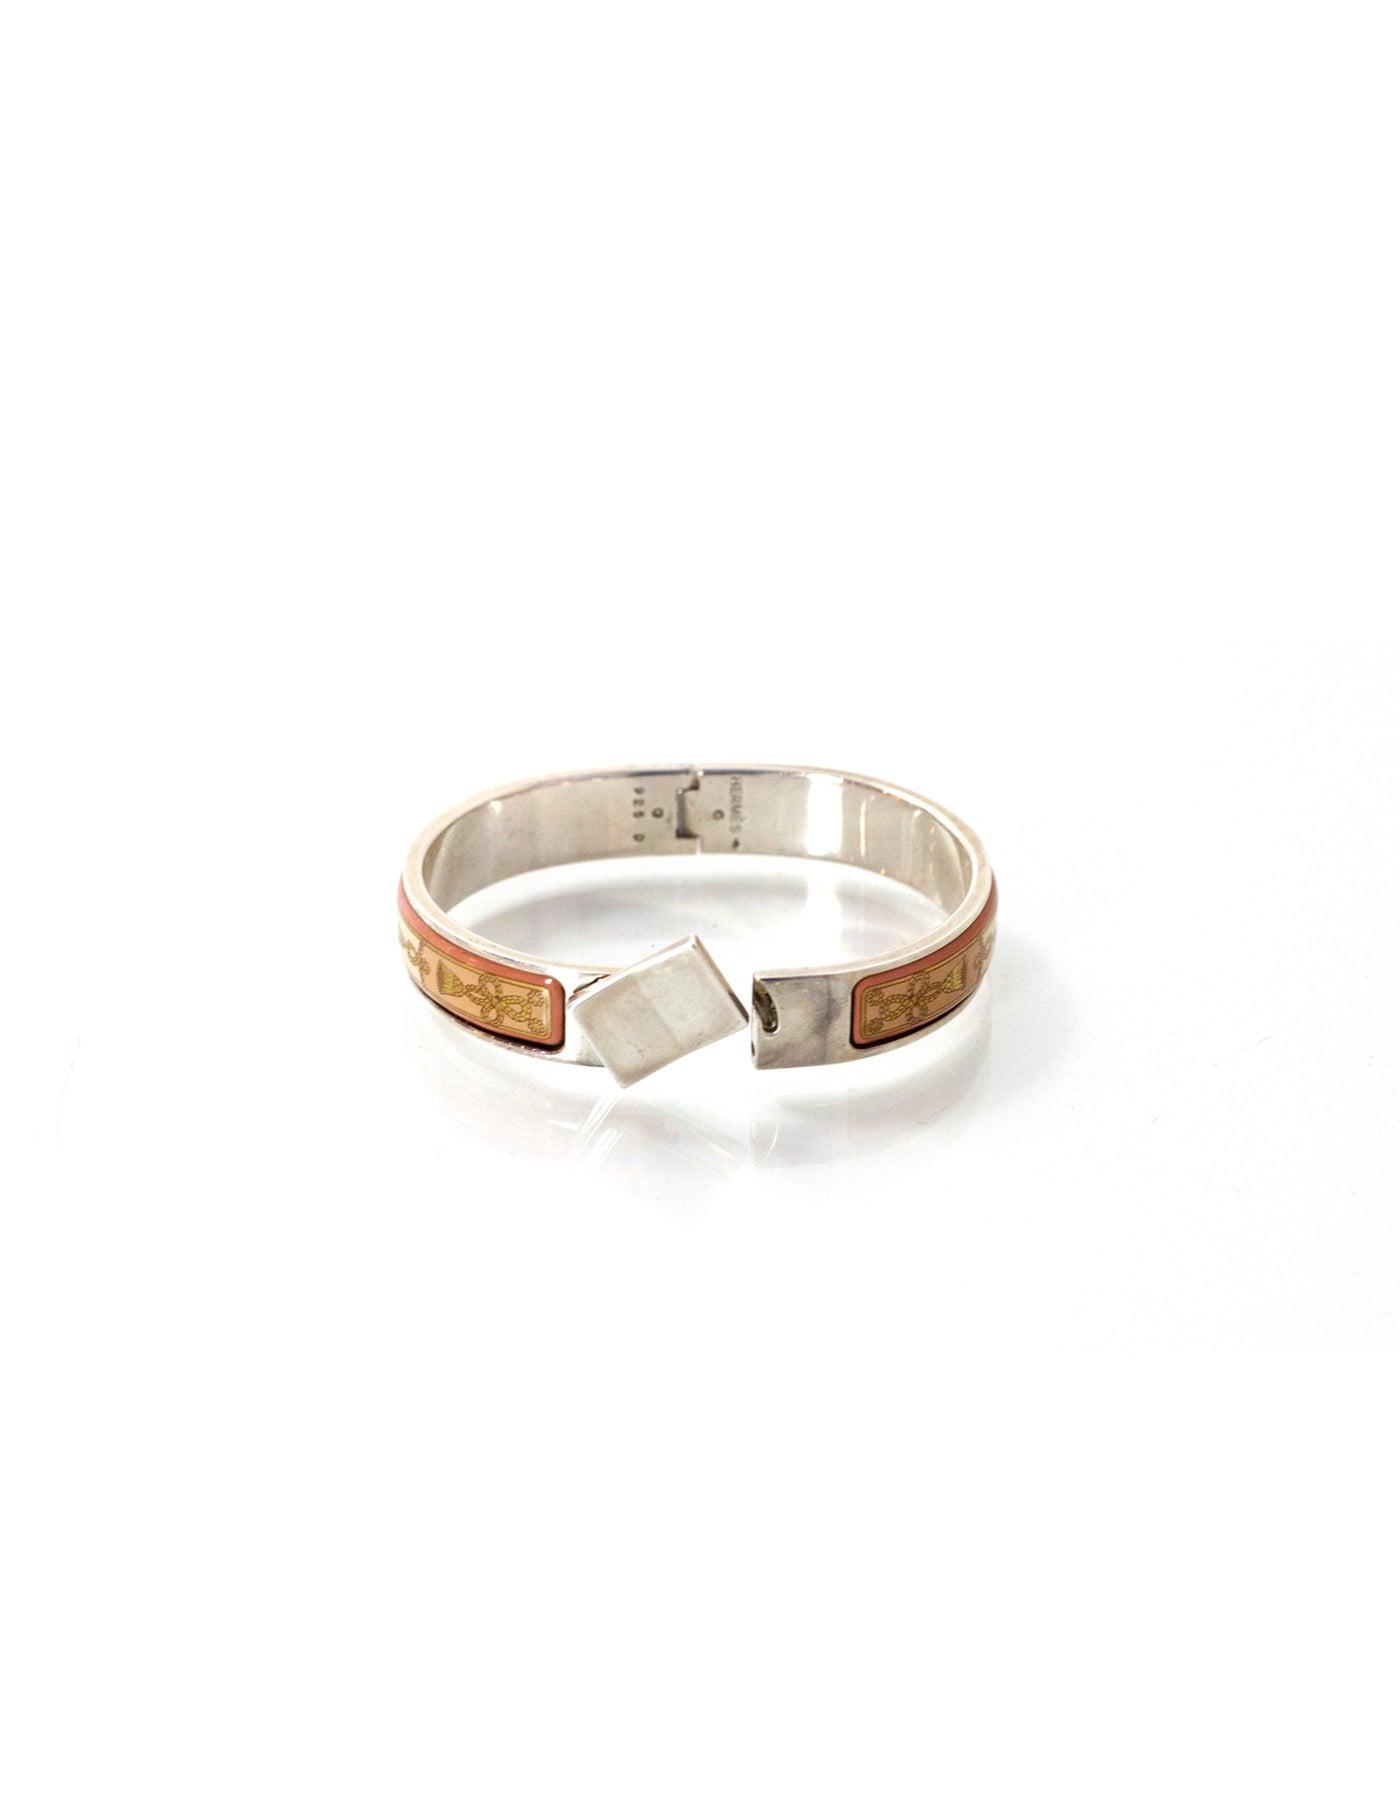 ef491c5557f Hermes Pink Tassel Print Enamel and Sterling Narrow Loquet Clic Clac  Bracelet at 1stdibs